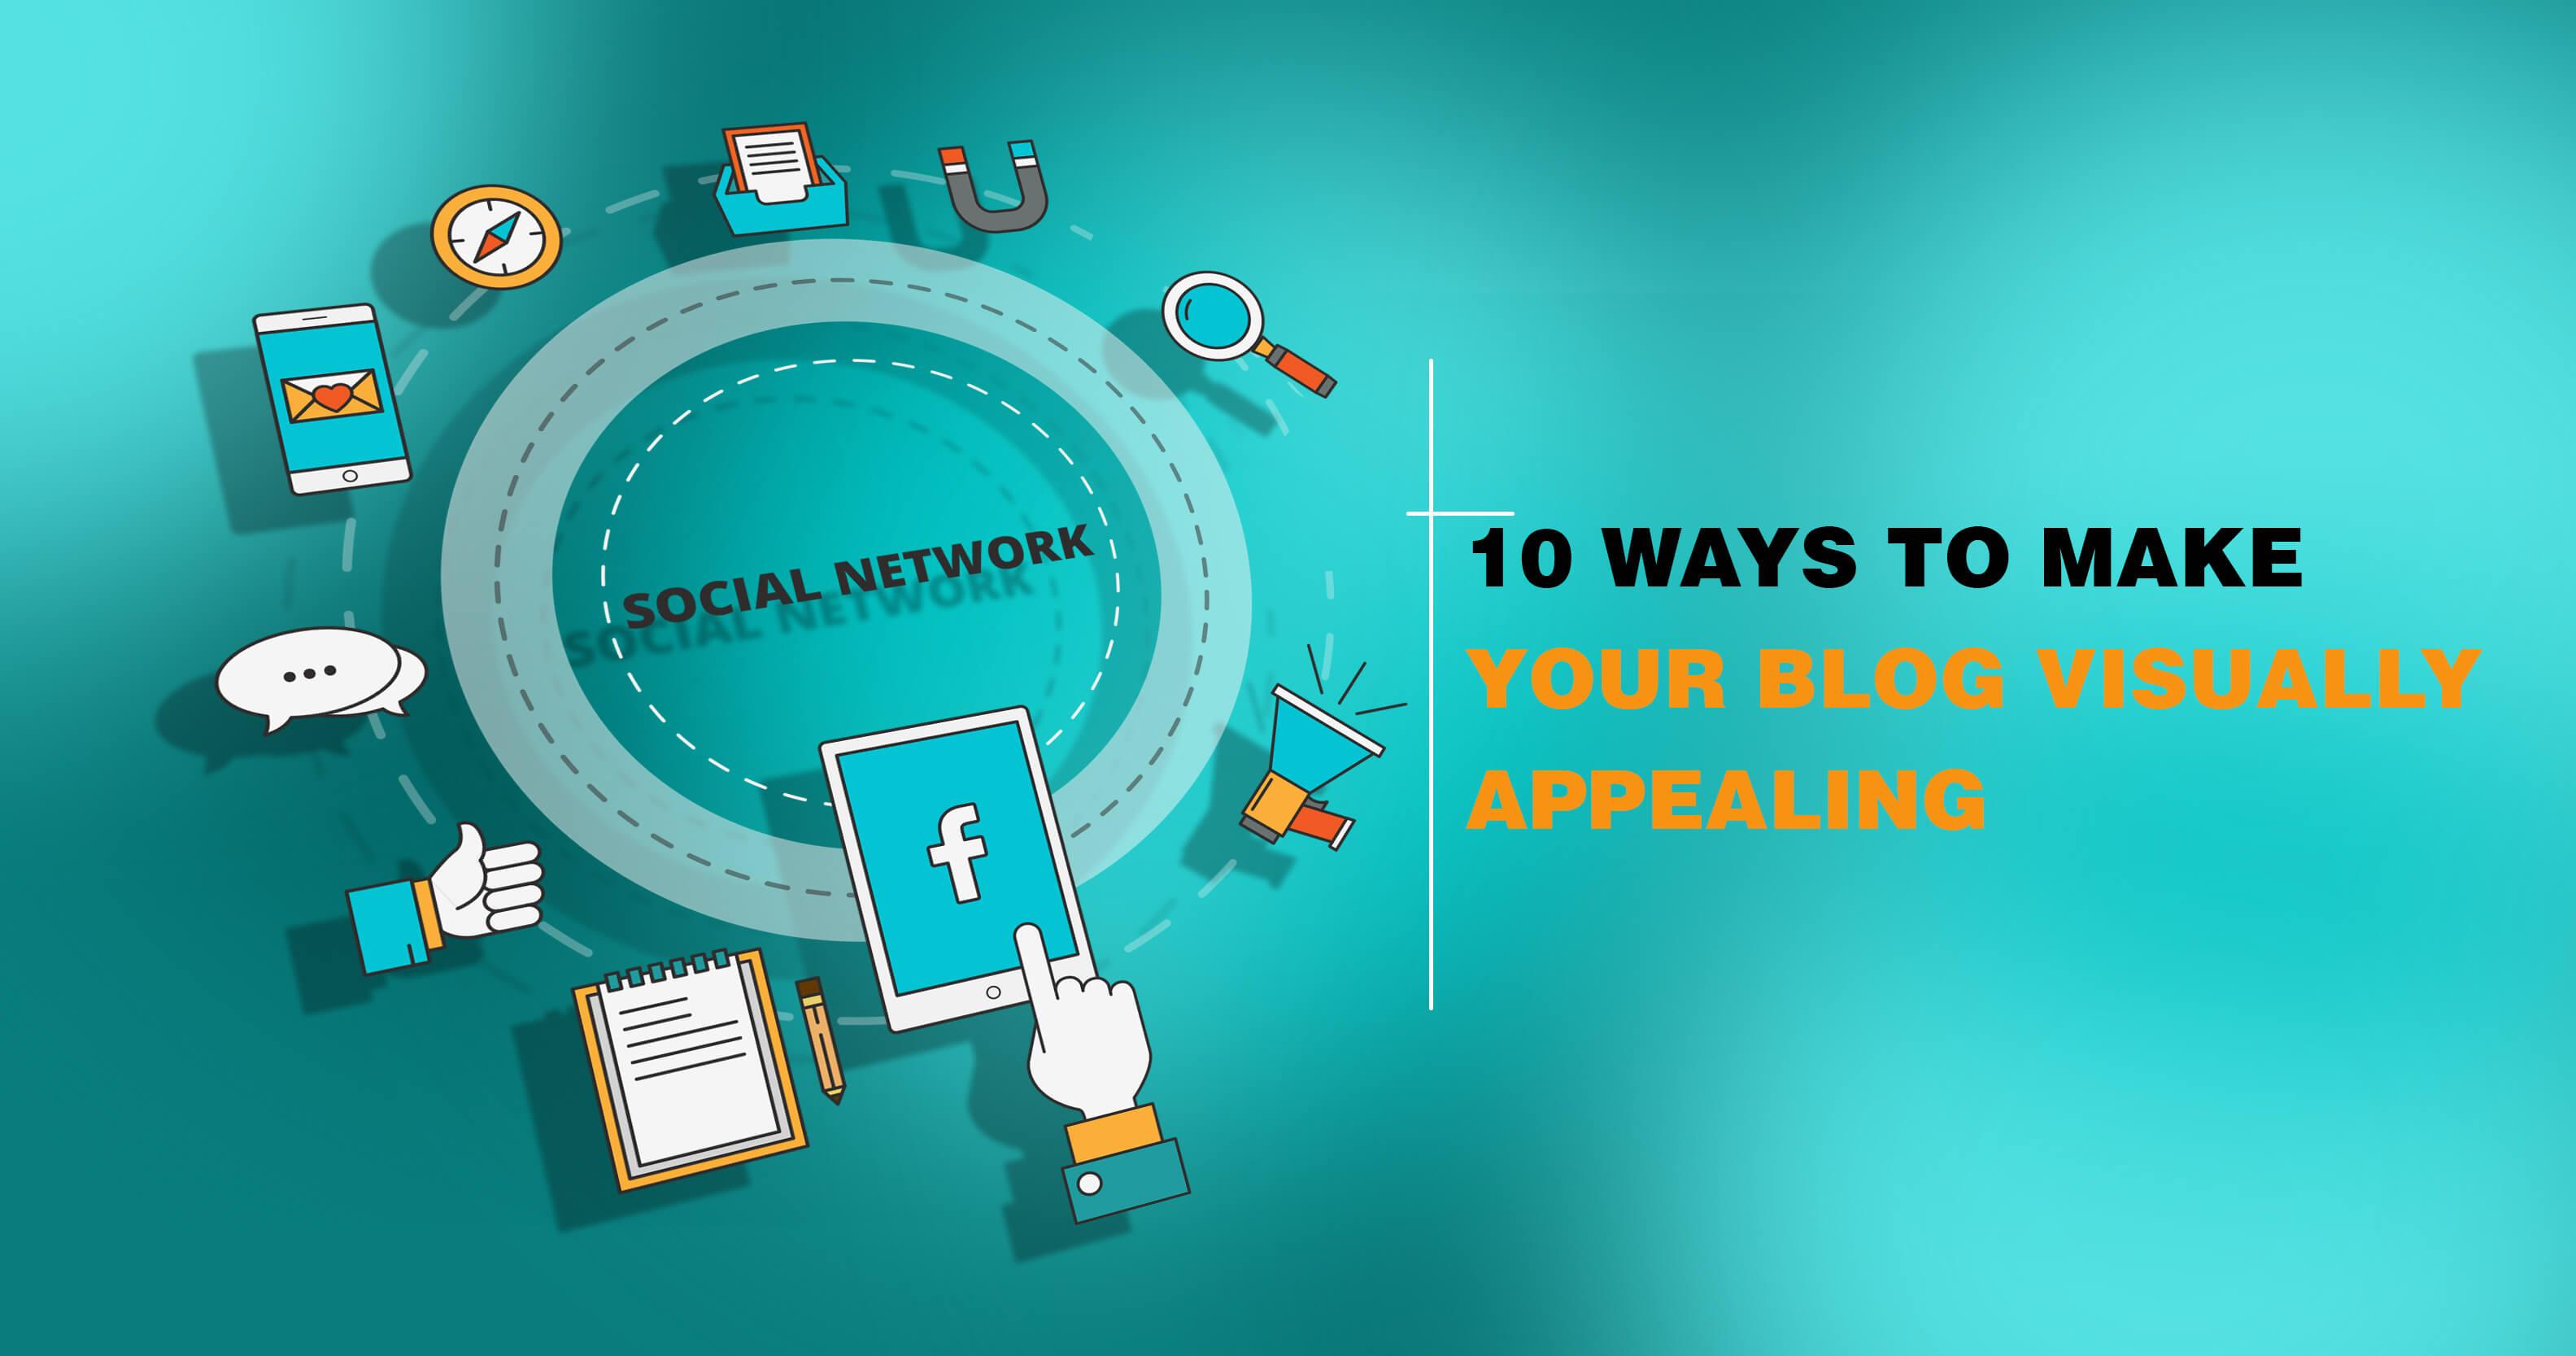 blog marketing ideas